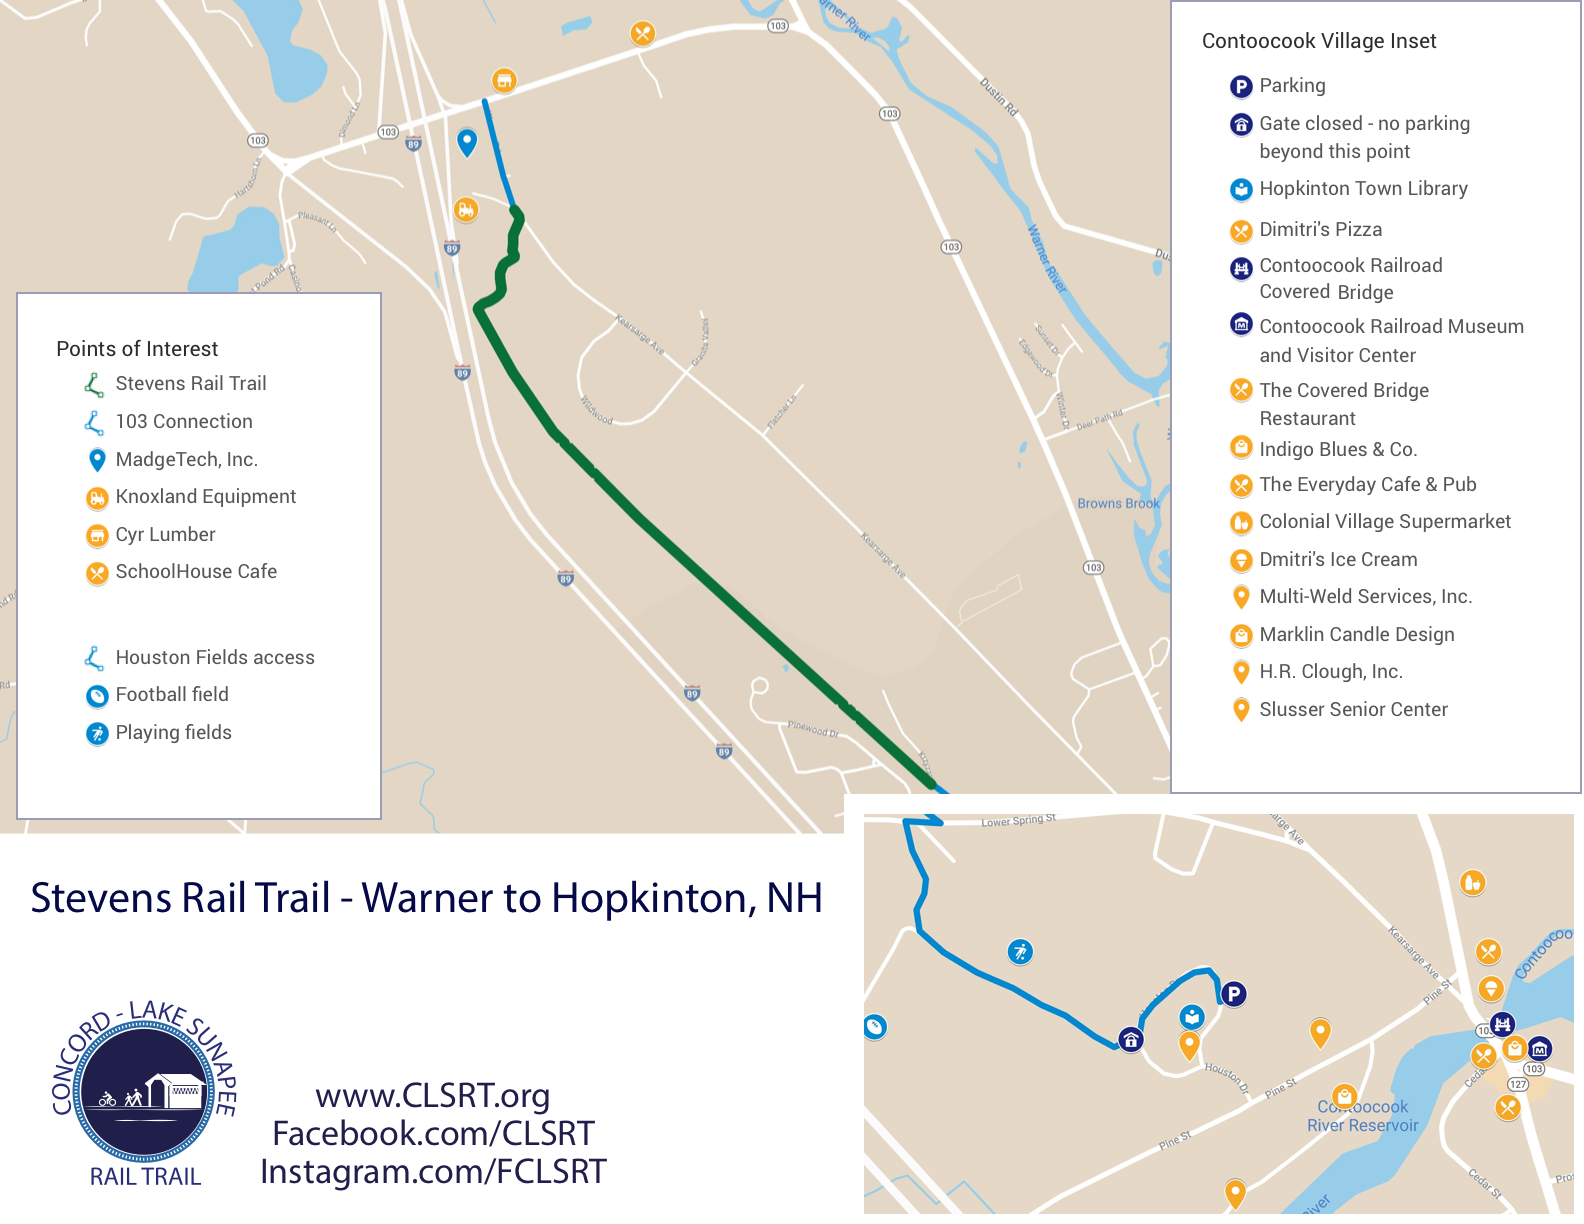 Map of the Stevens Rail Trail.